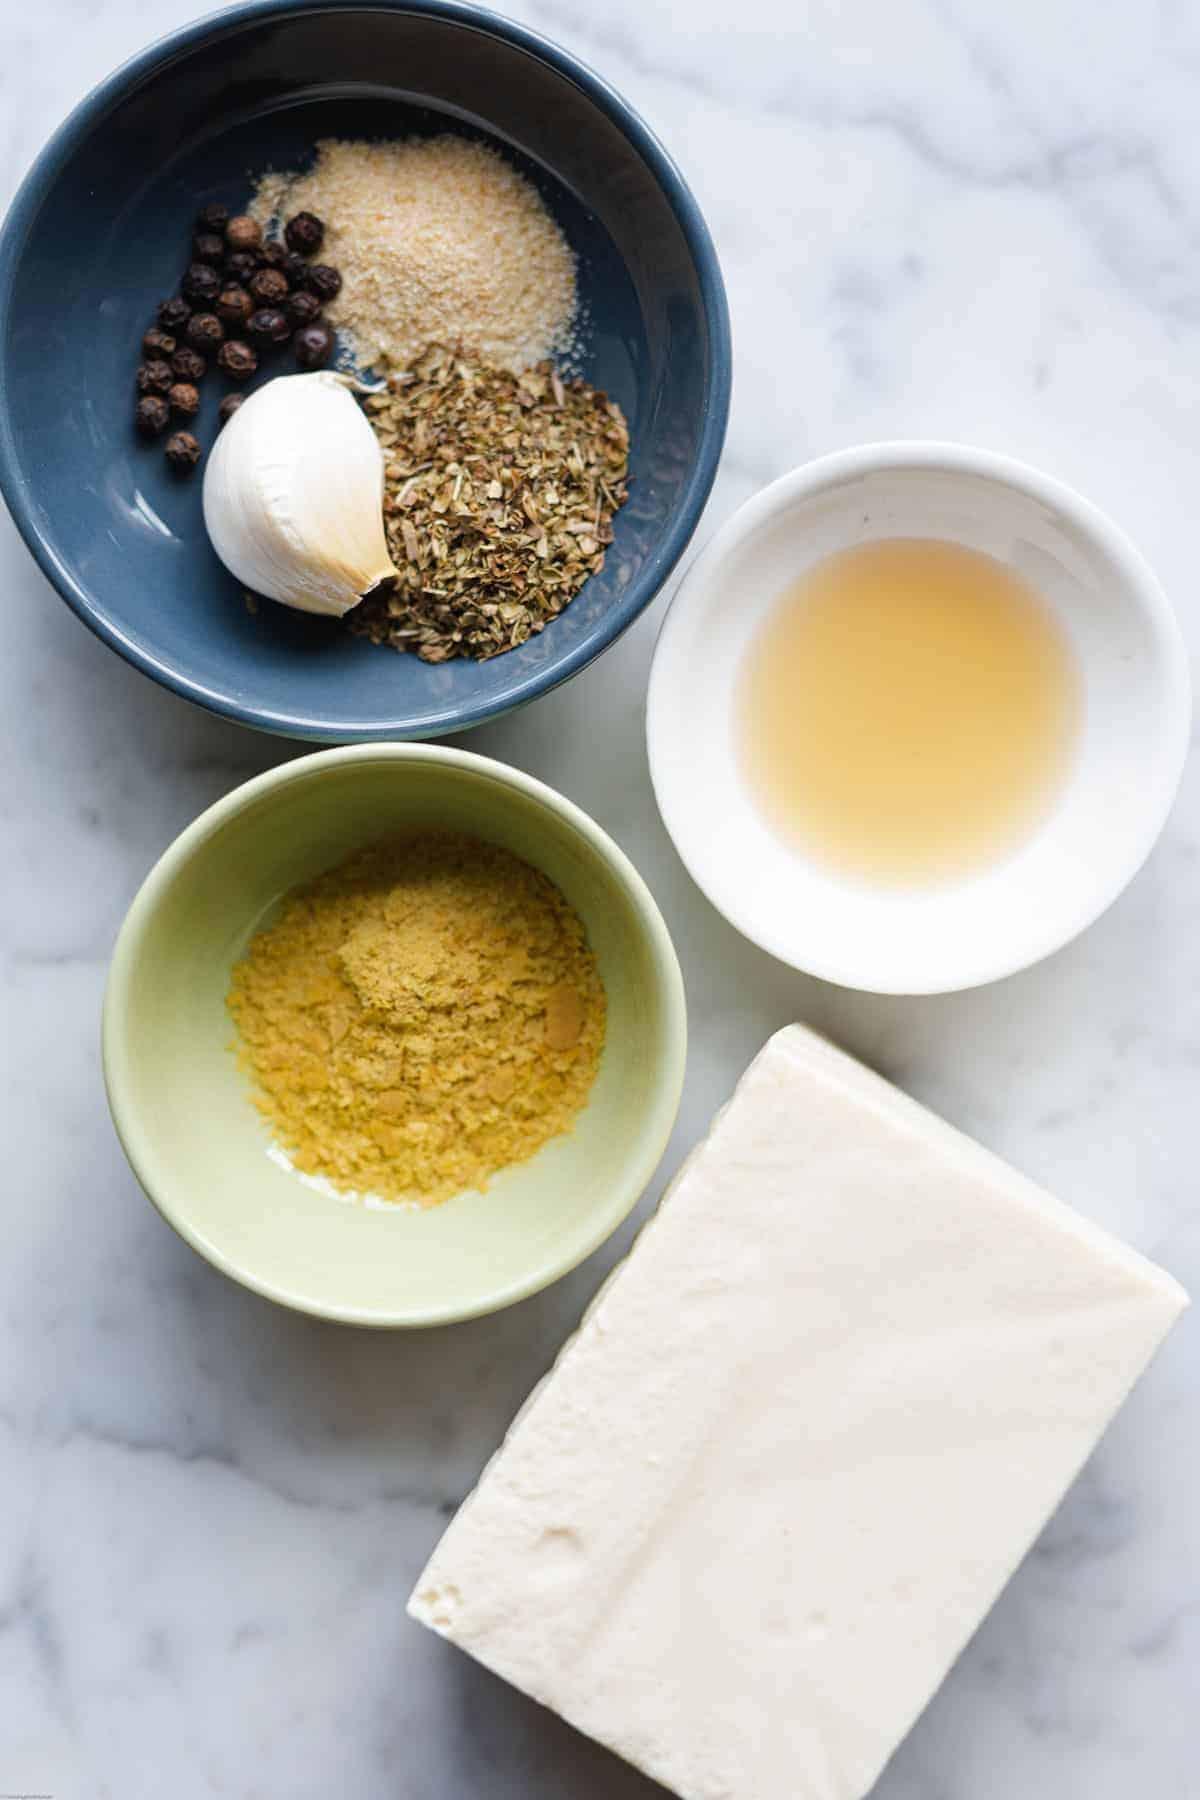 Ingredients for Creamy Lemon Pepper Dressing: onion powder, ground mustard seed, dried oregano, silken tofu, black pepper, garlic, apple cider vinegar, and nutritional yeast.